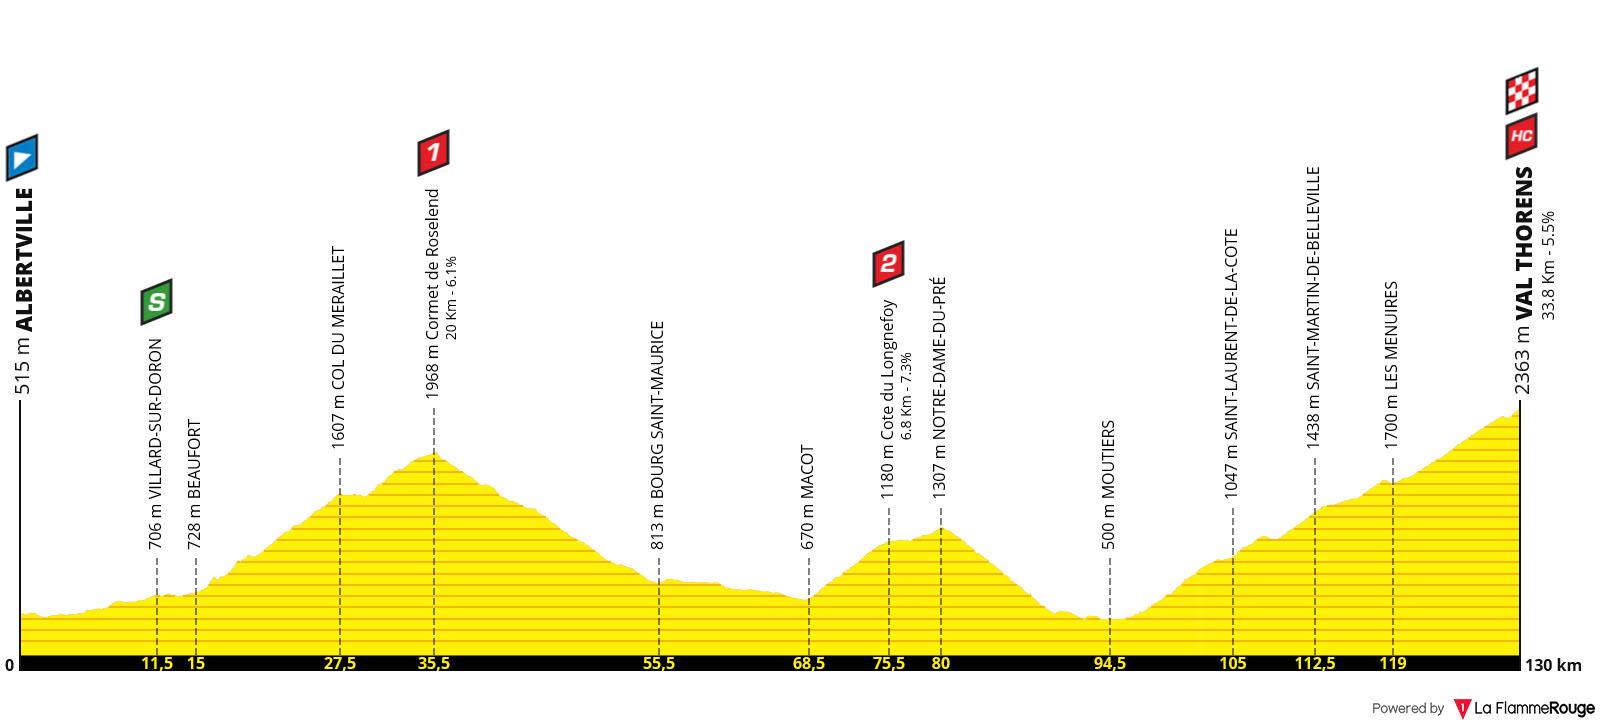 Perfil Etapa 20 - Tour de Francia 2019